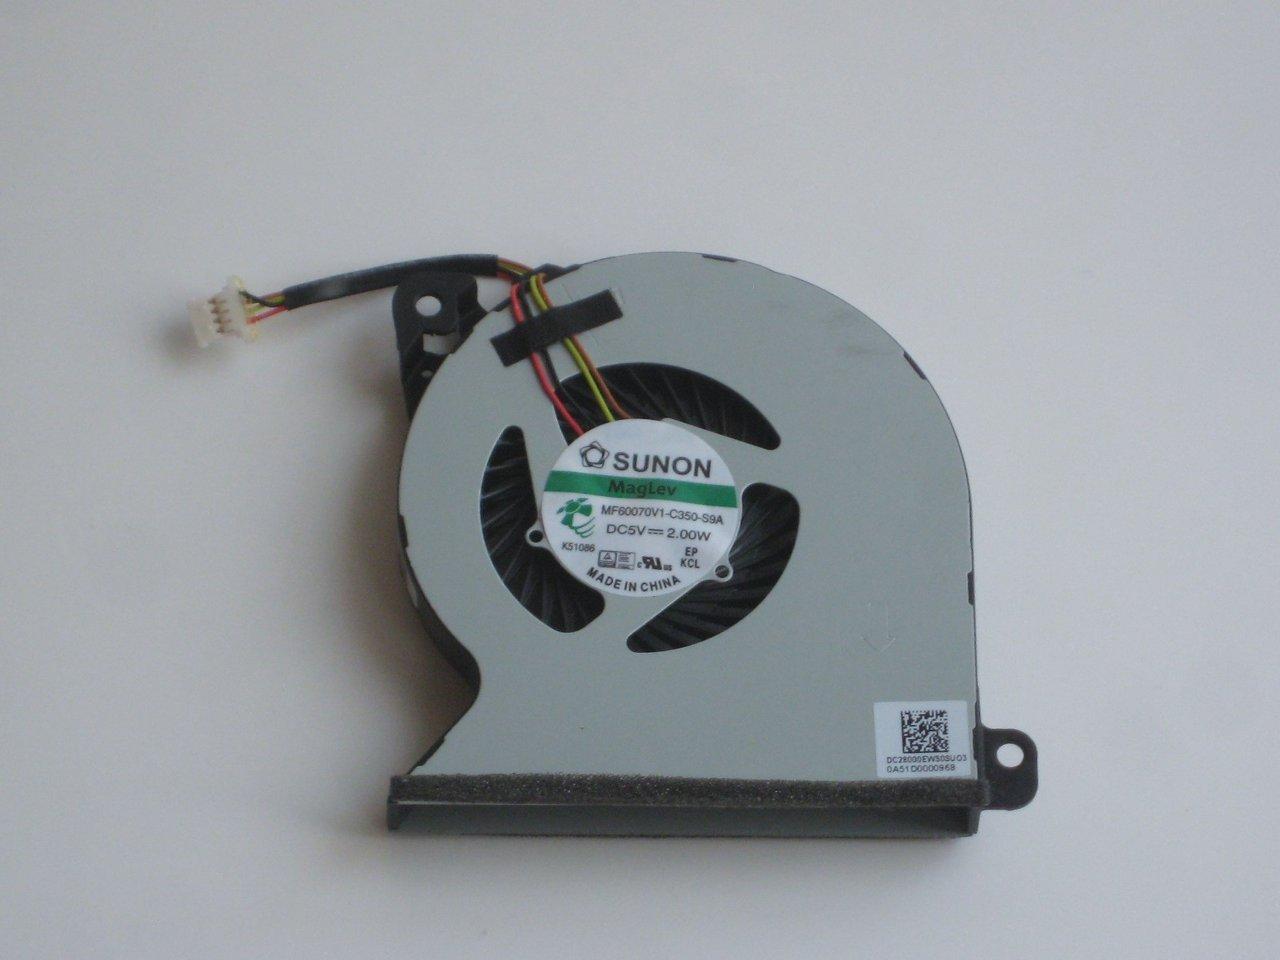 SUNON MF60070V1-C350-S9A Вентилятор ноутбук HP Probook 450 G2